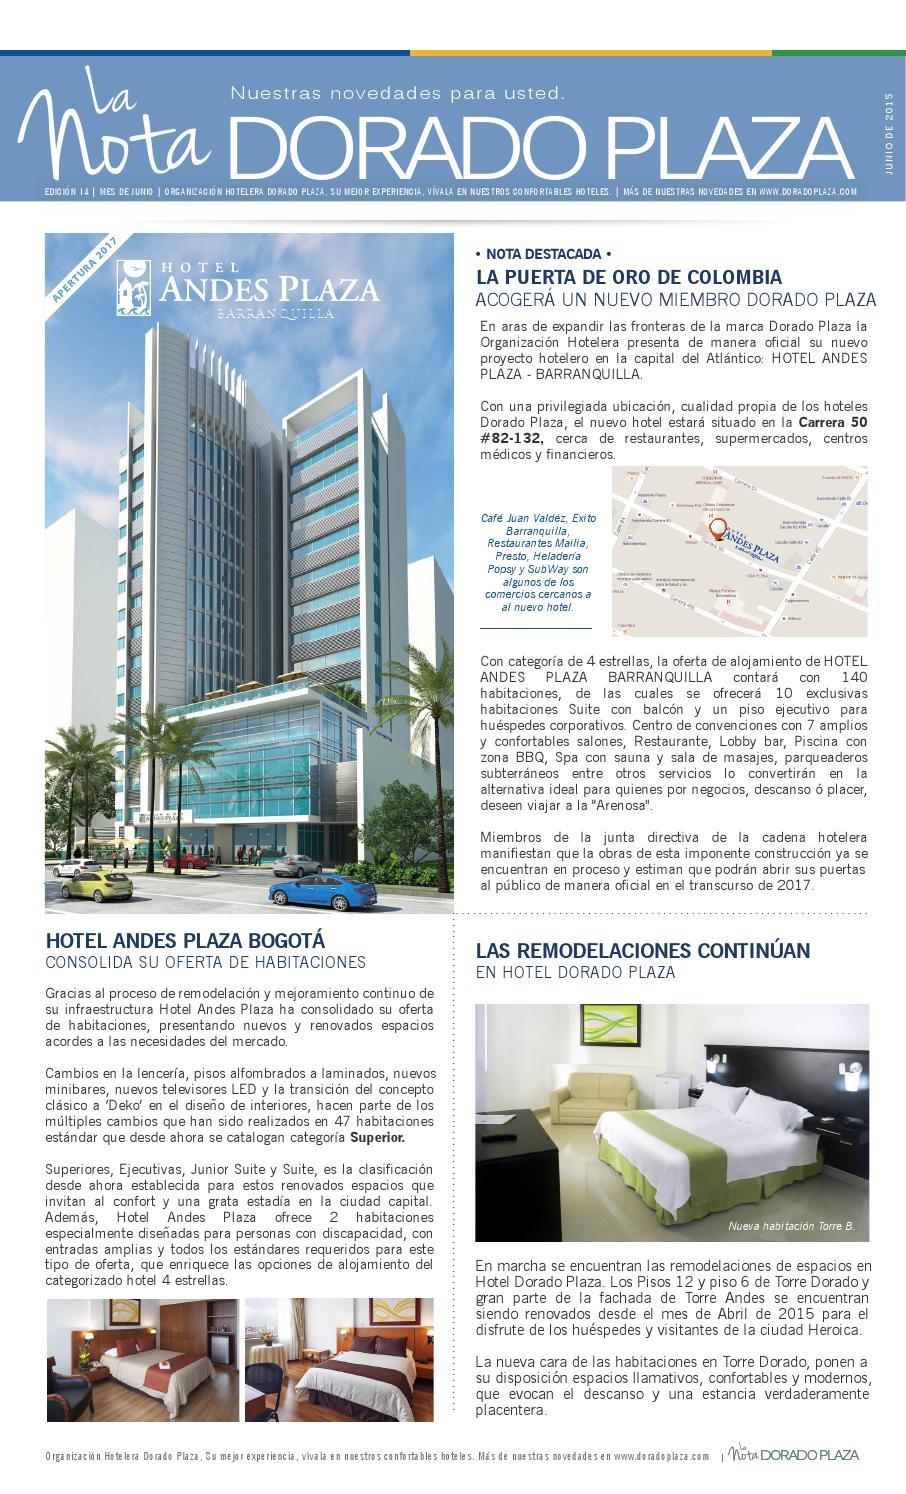 Alojamiento Cuarto Hosprdaje Hotel Andes Plaza Carnaval Barranquillsa 2020